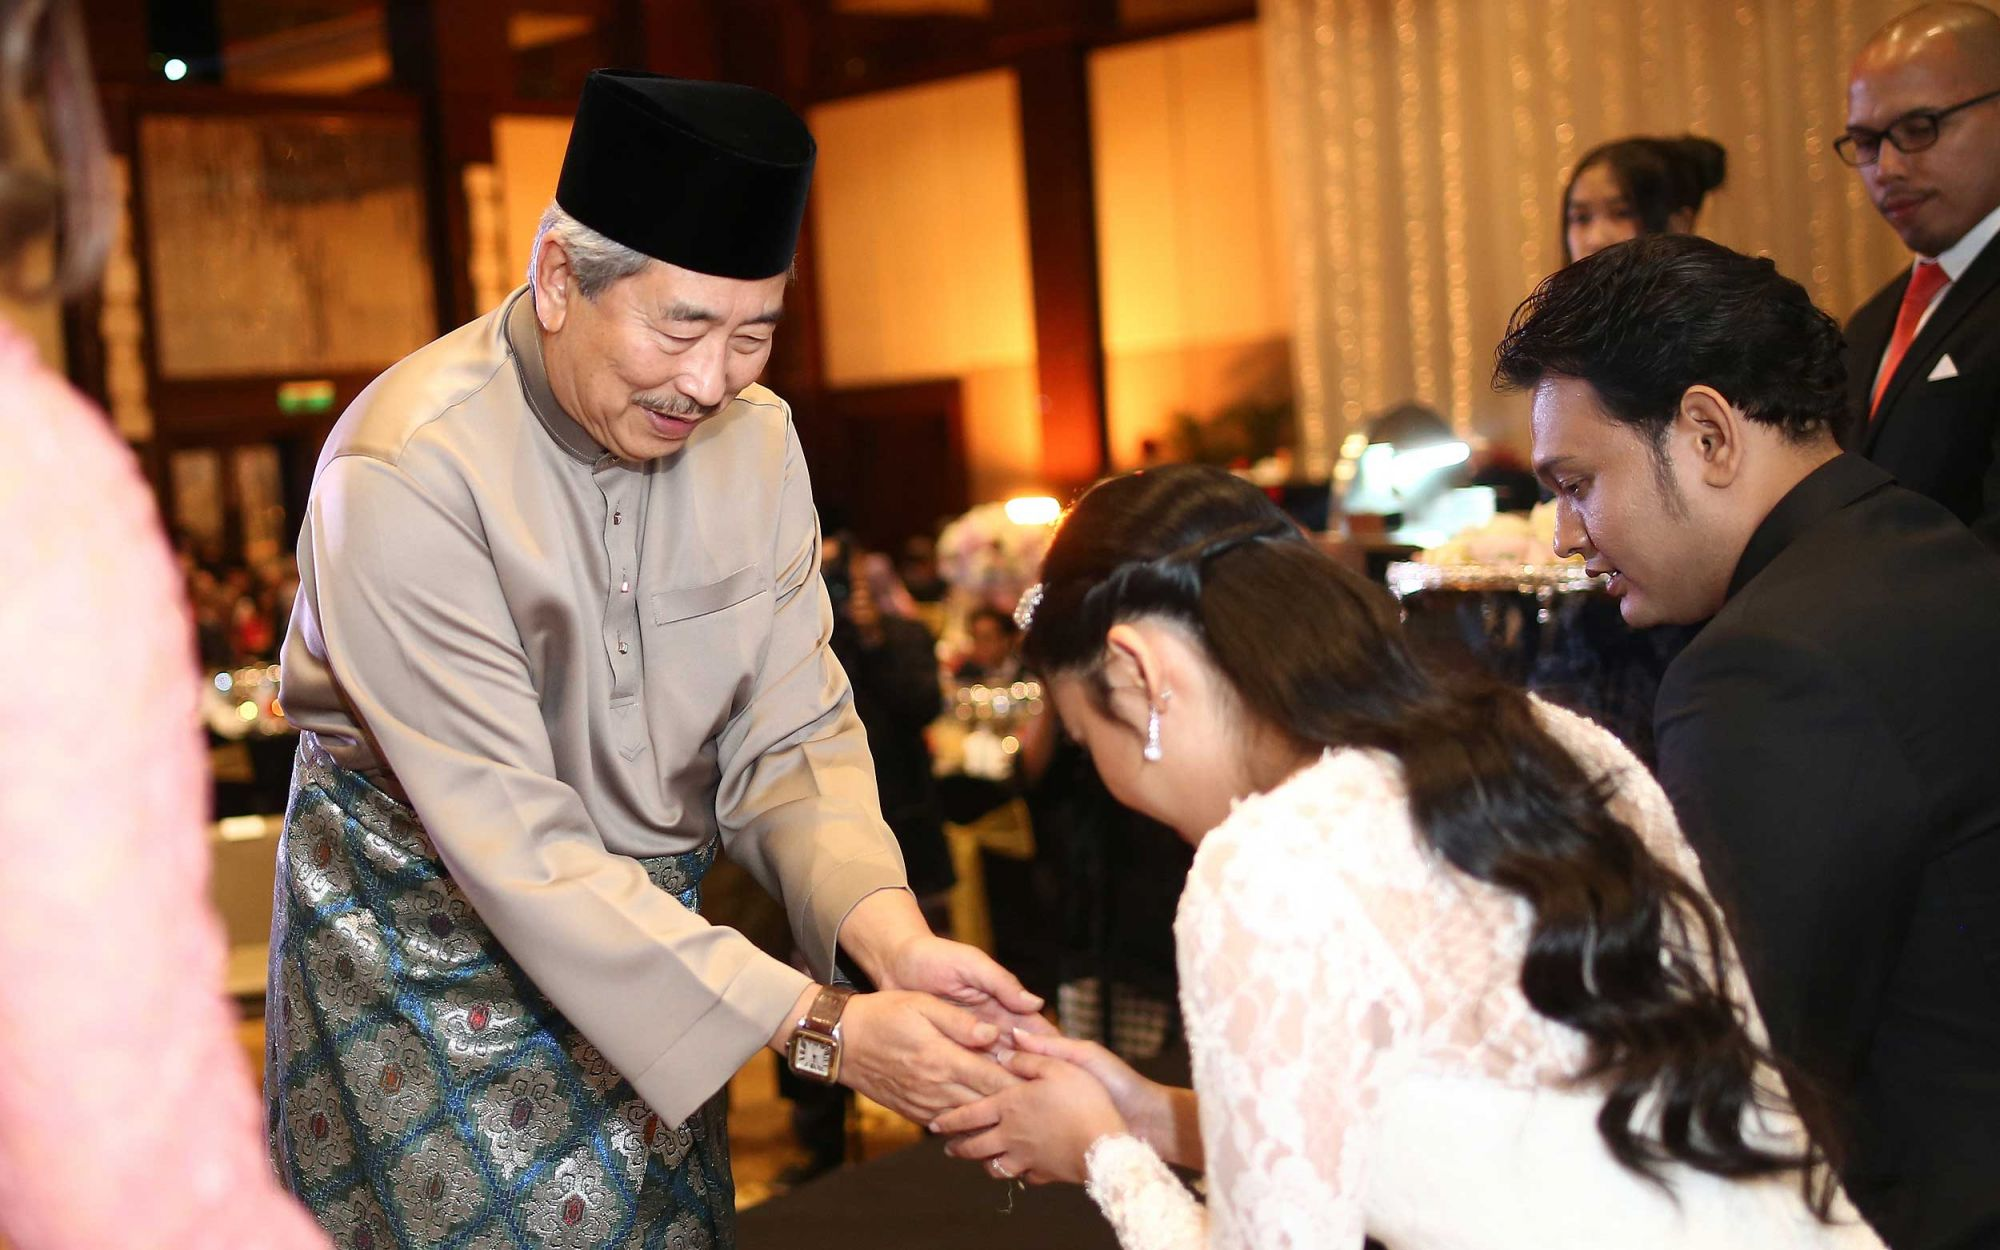 Tengku Ahmad Shah Alhaj giving the bride his blessings